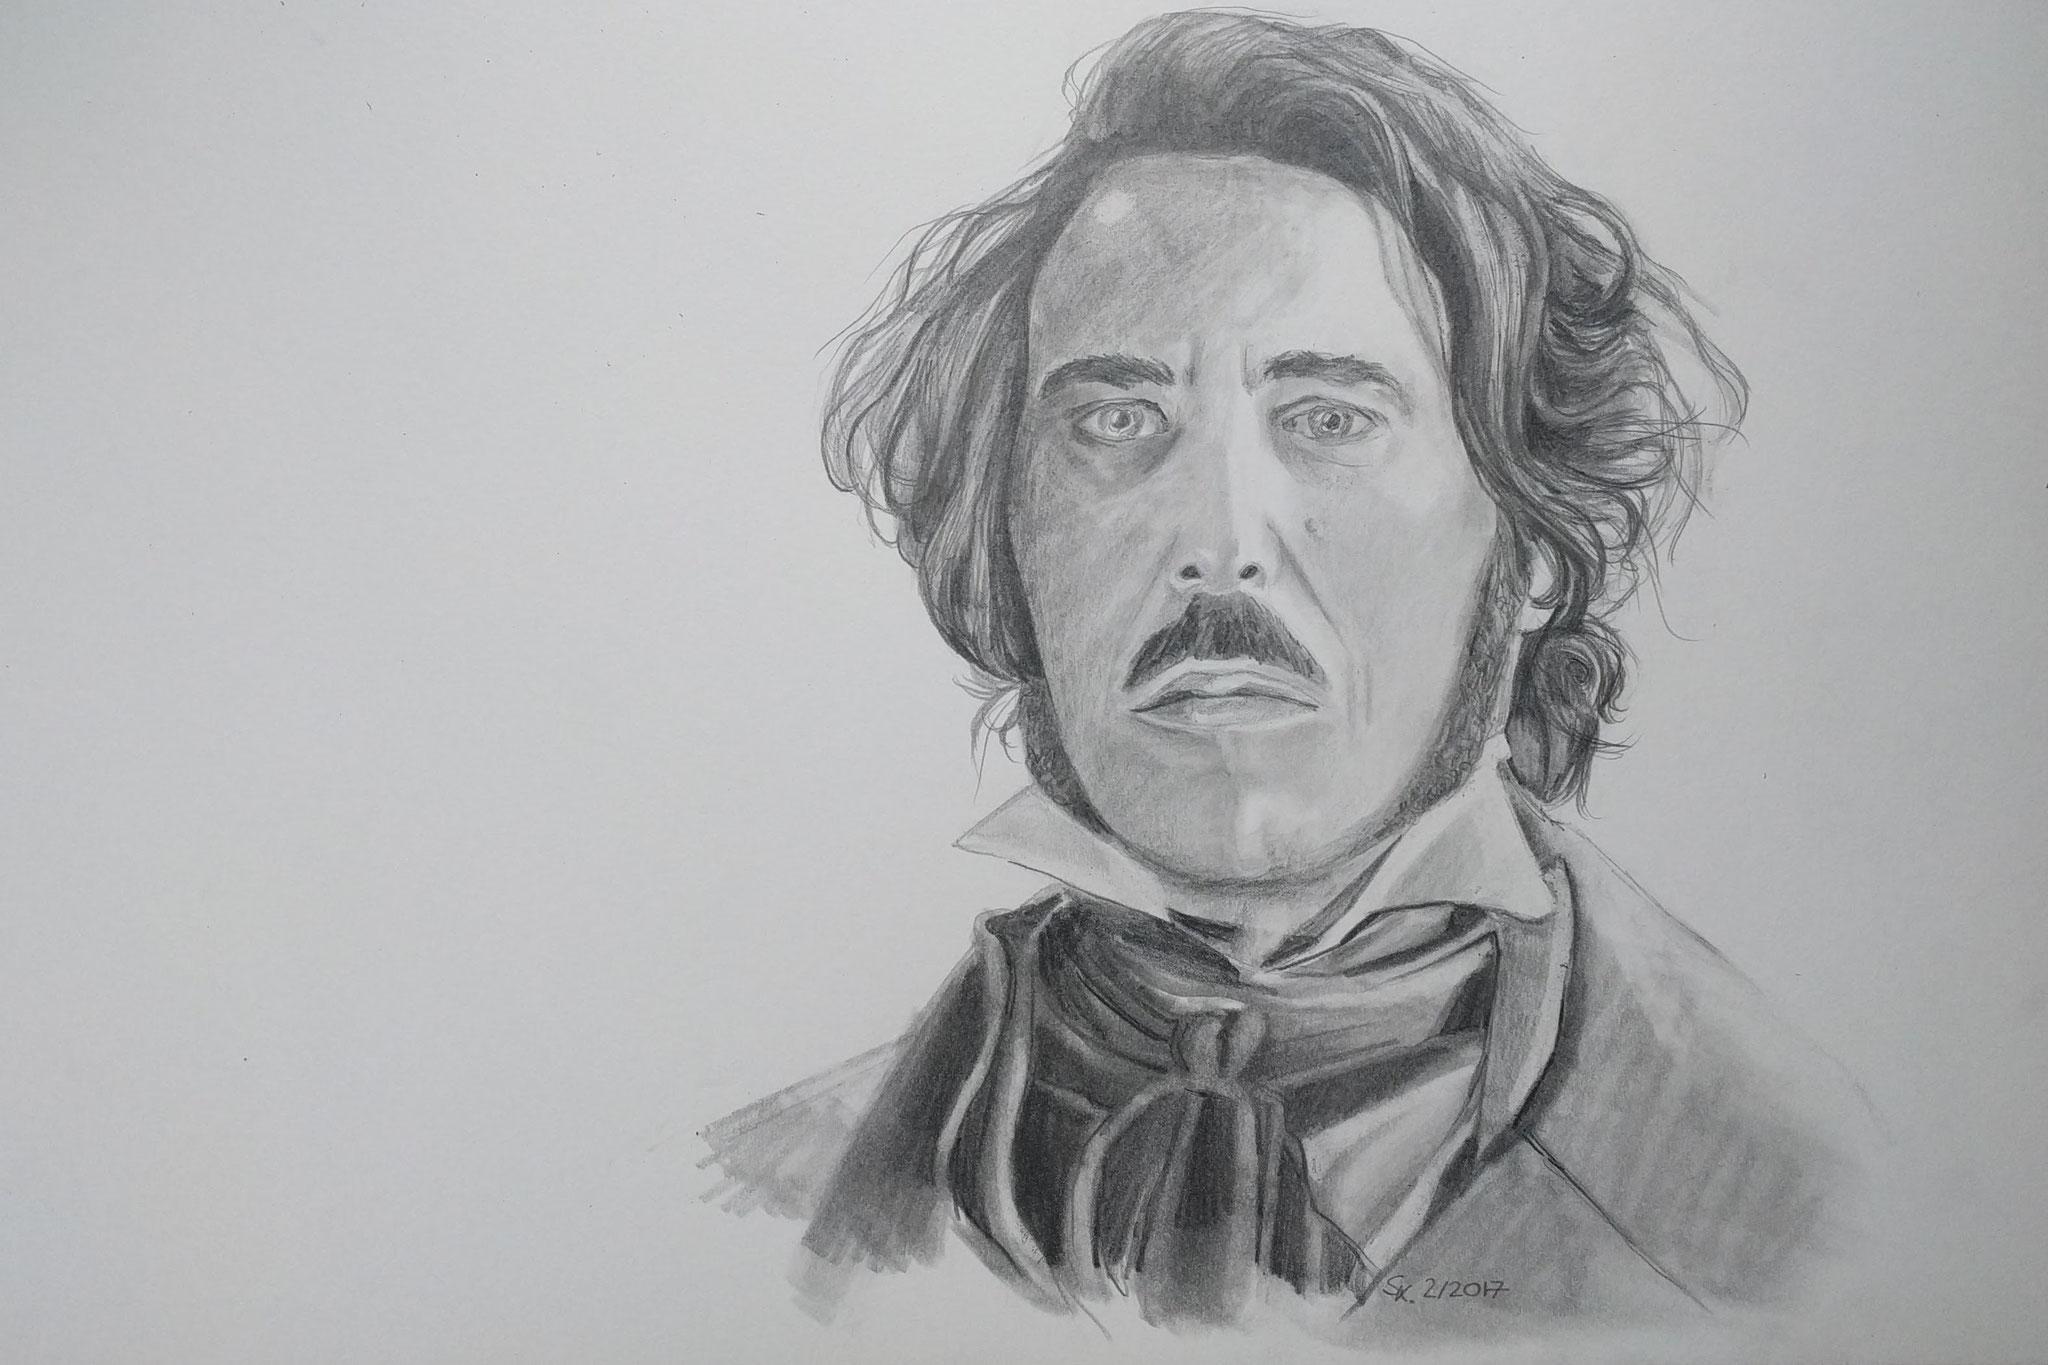 Ciarán Hinds als Edward Rochester (Skizzenblock, DIN A3)